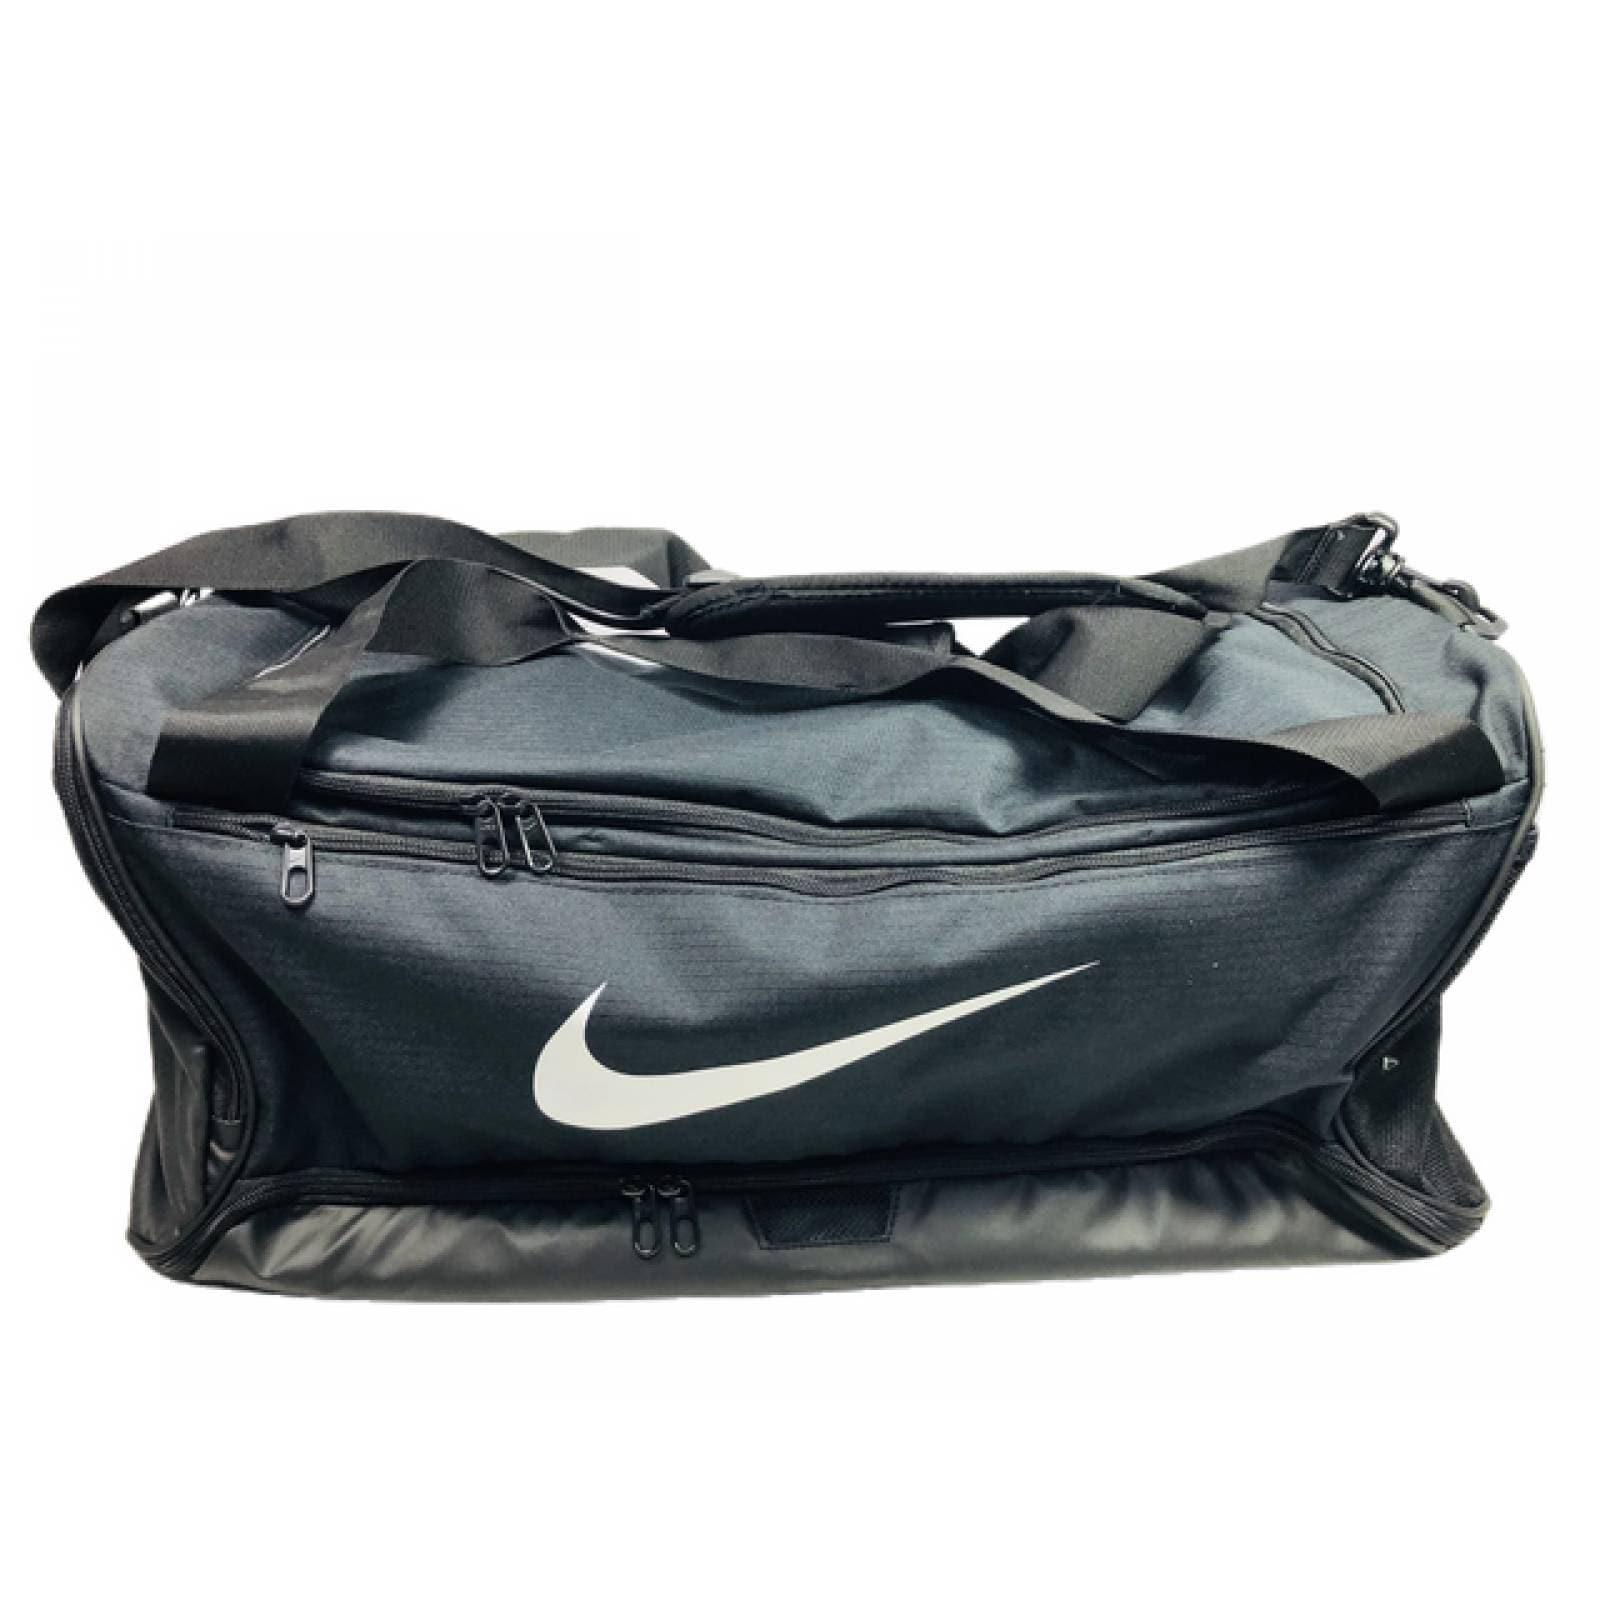 Nacarado llave inglesa garaje  Bolsa Mochila Deportiva Nike Original Color Negro Tipo Brasilia